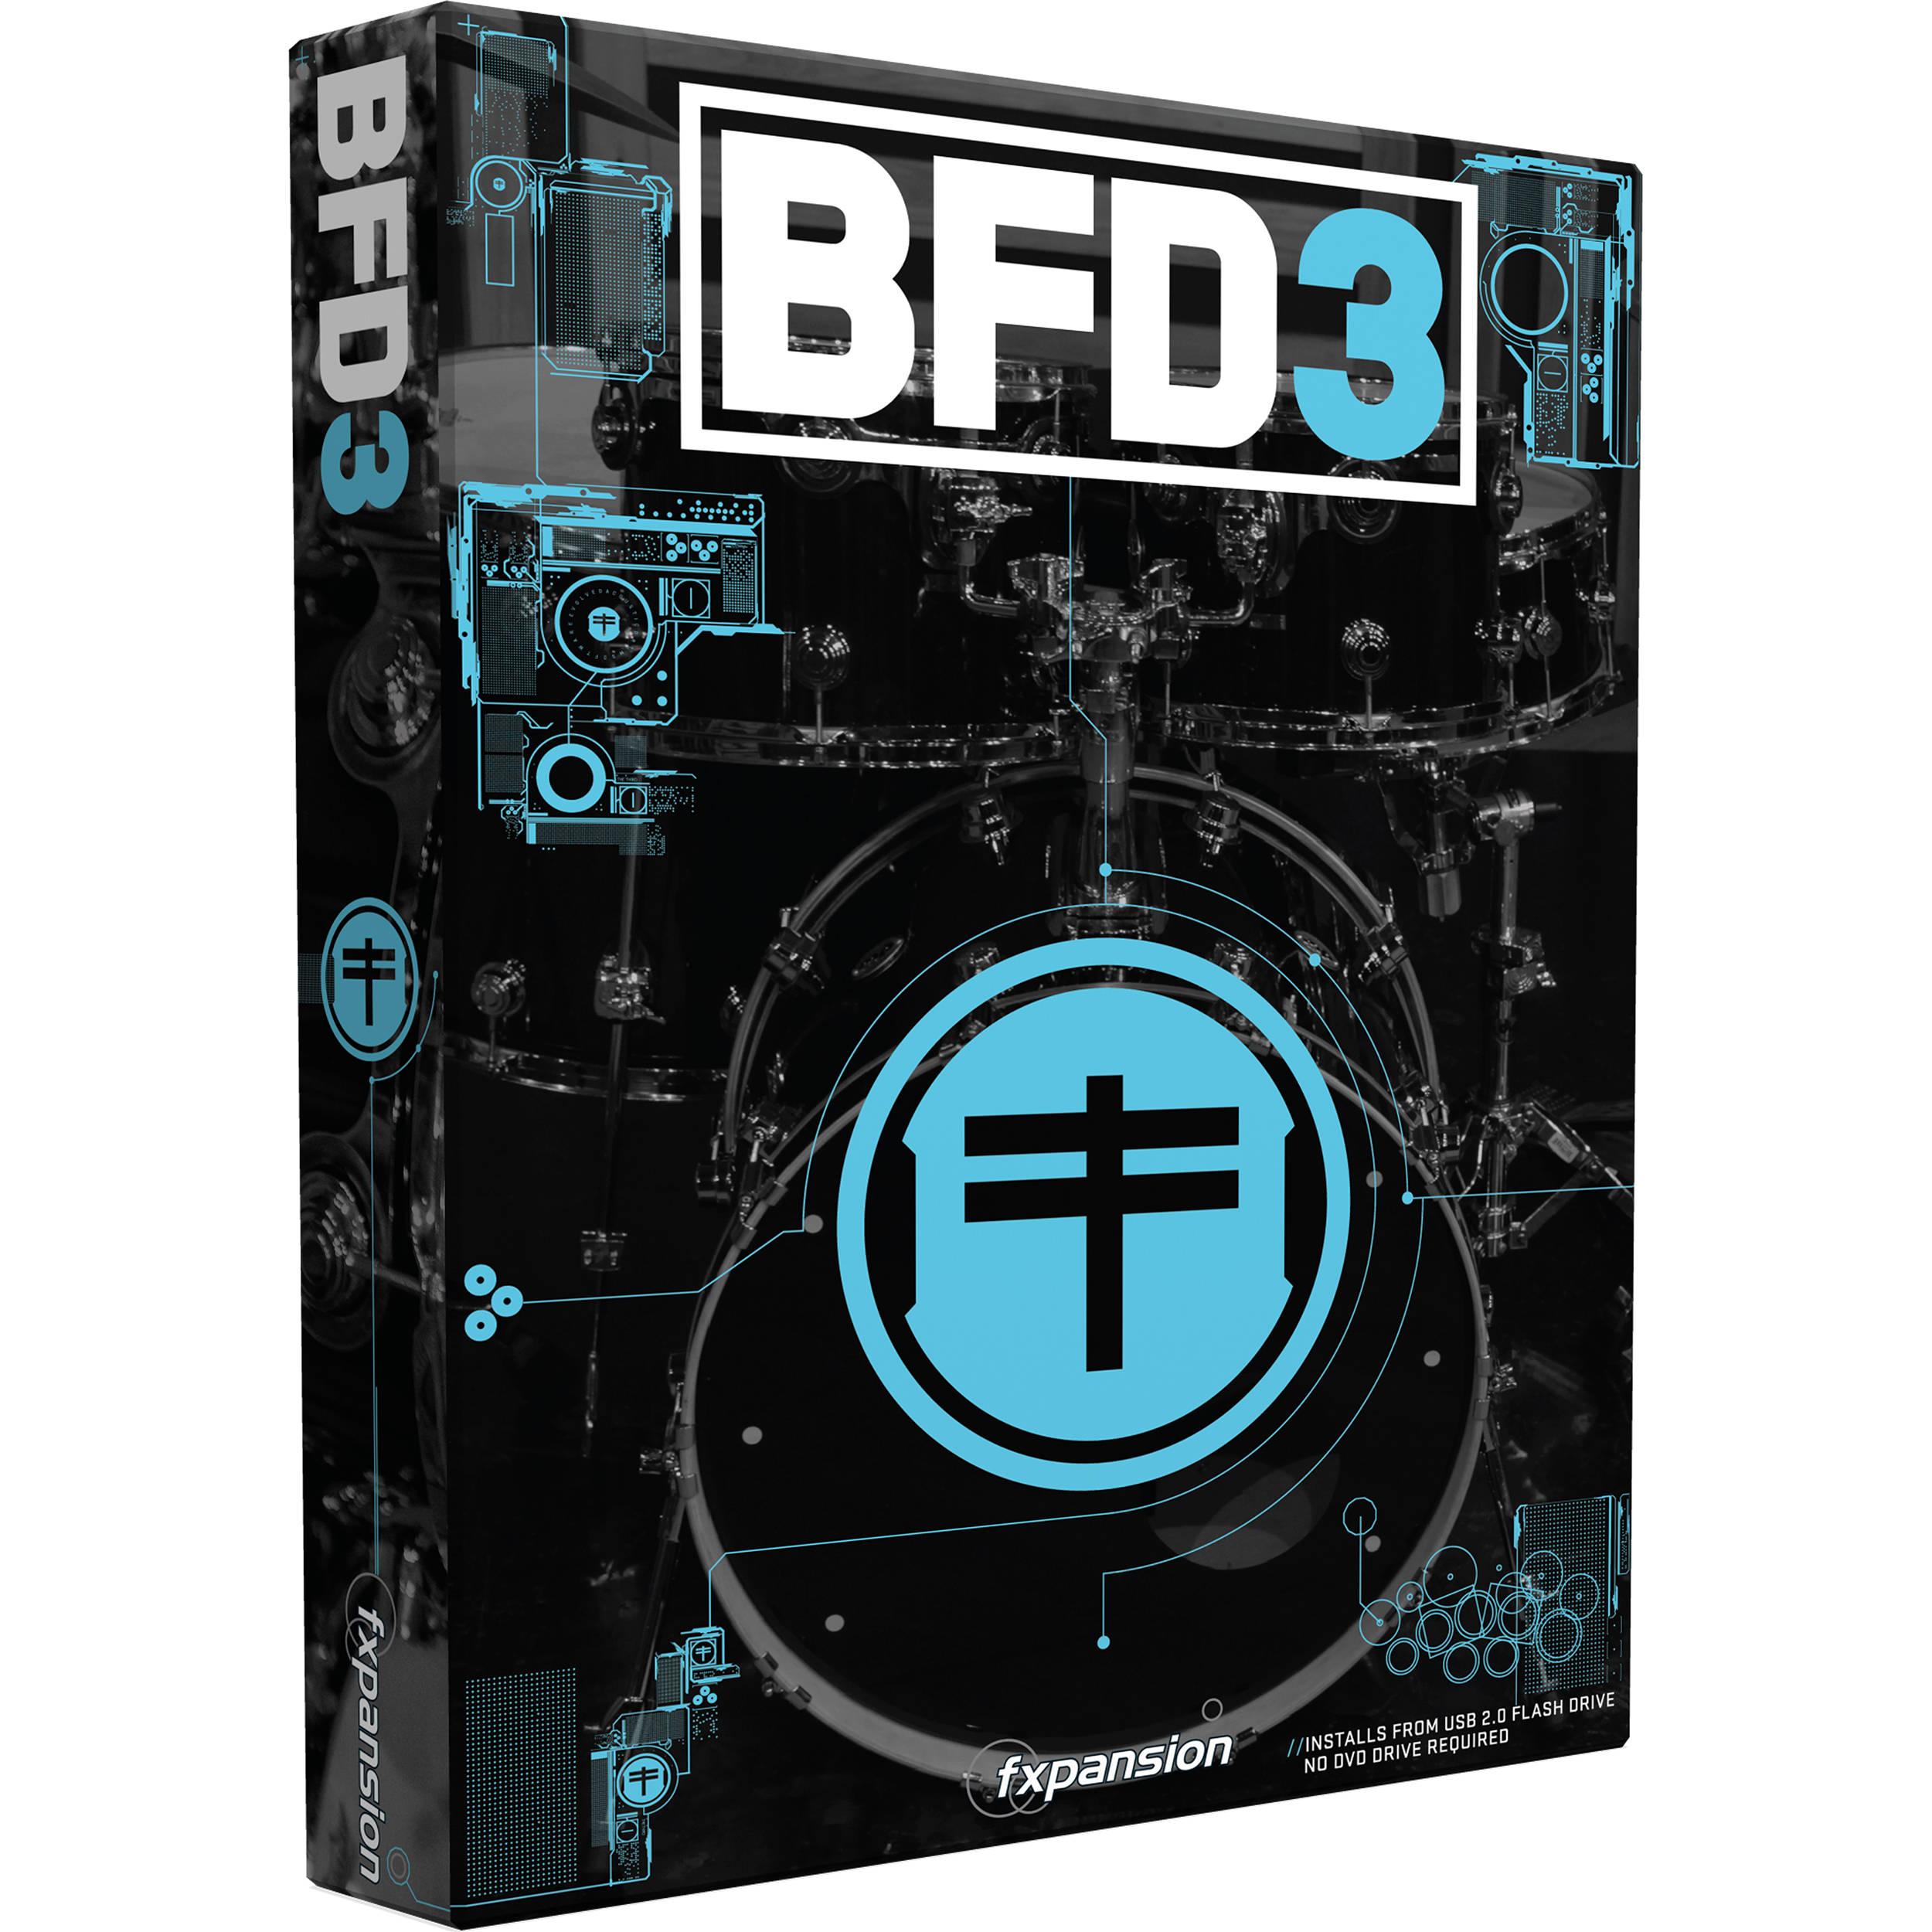 FXPansion BFD 3 upgradering från BFD 2